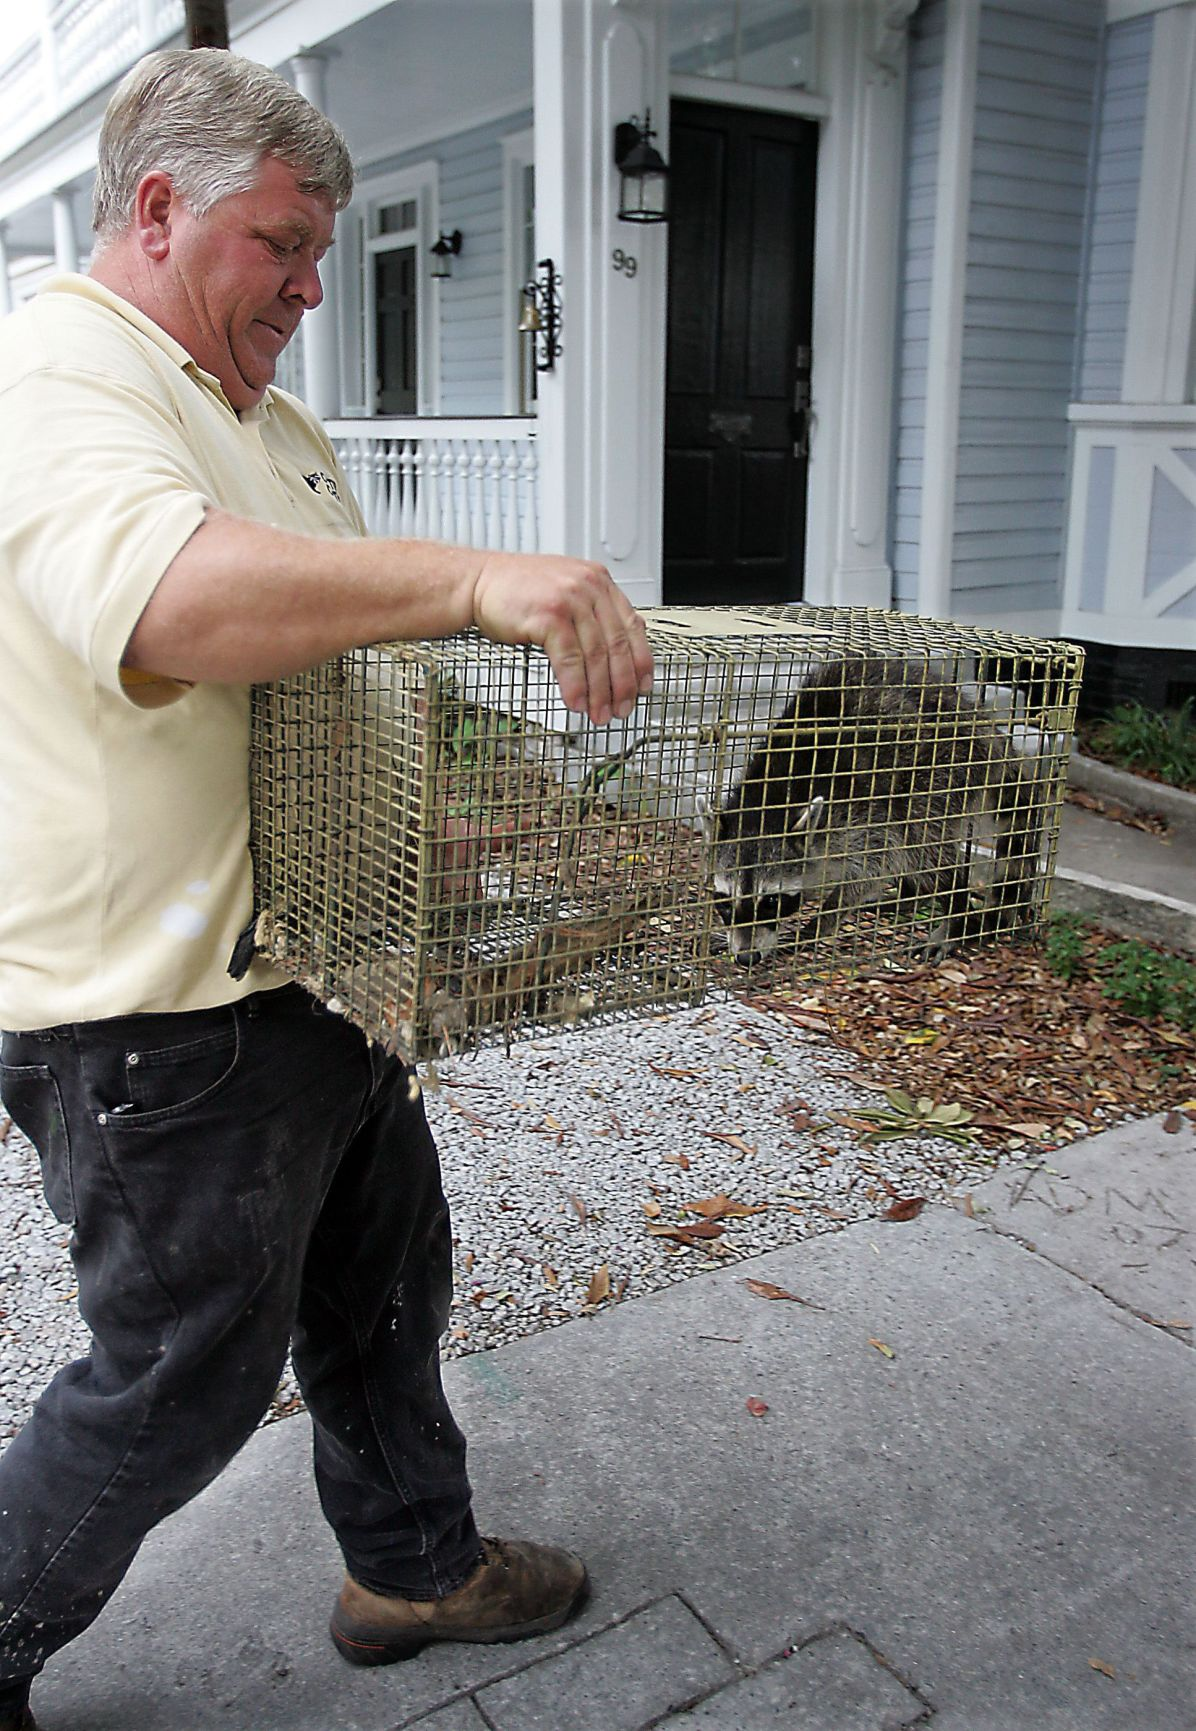 Critters around home?